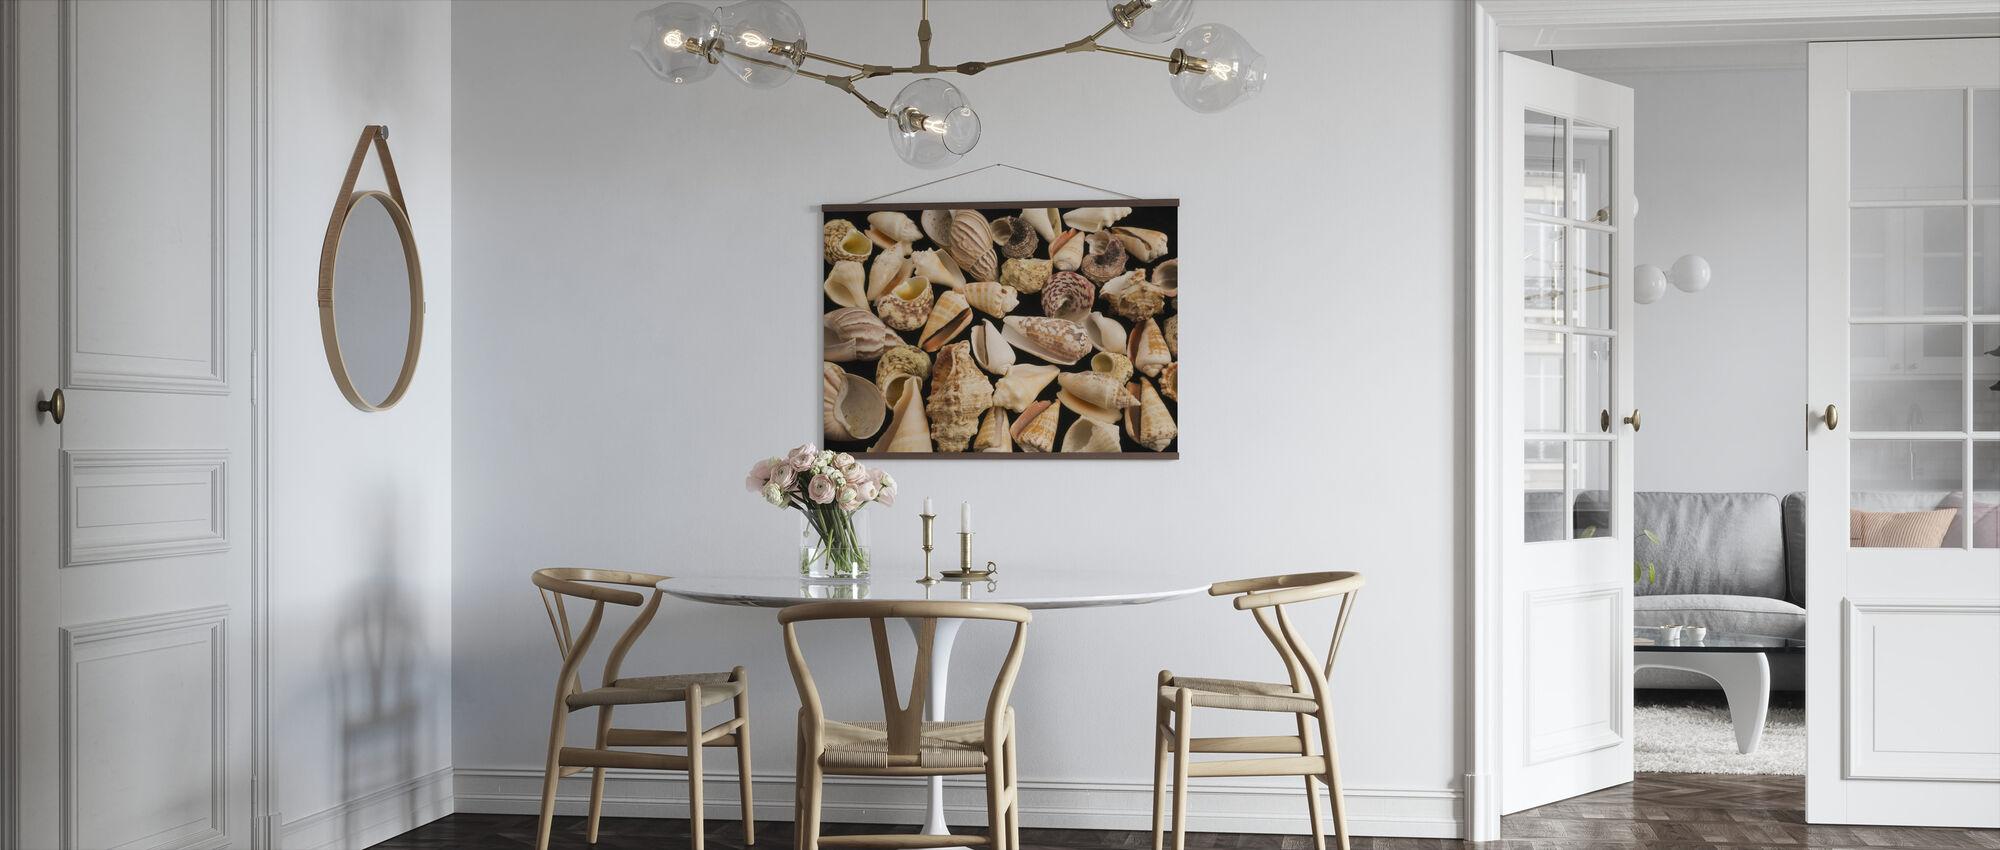 Con Shells - Poster - Kitchen